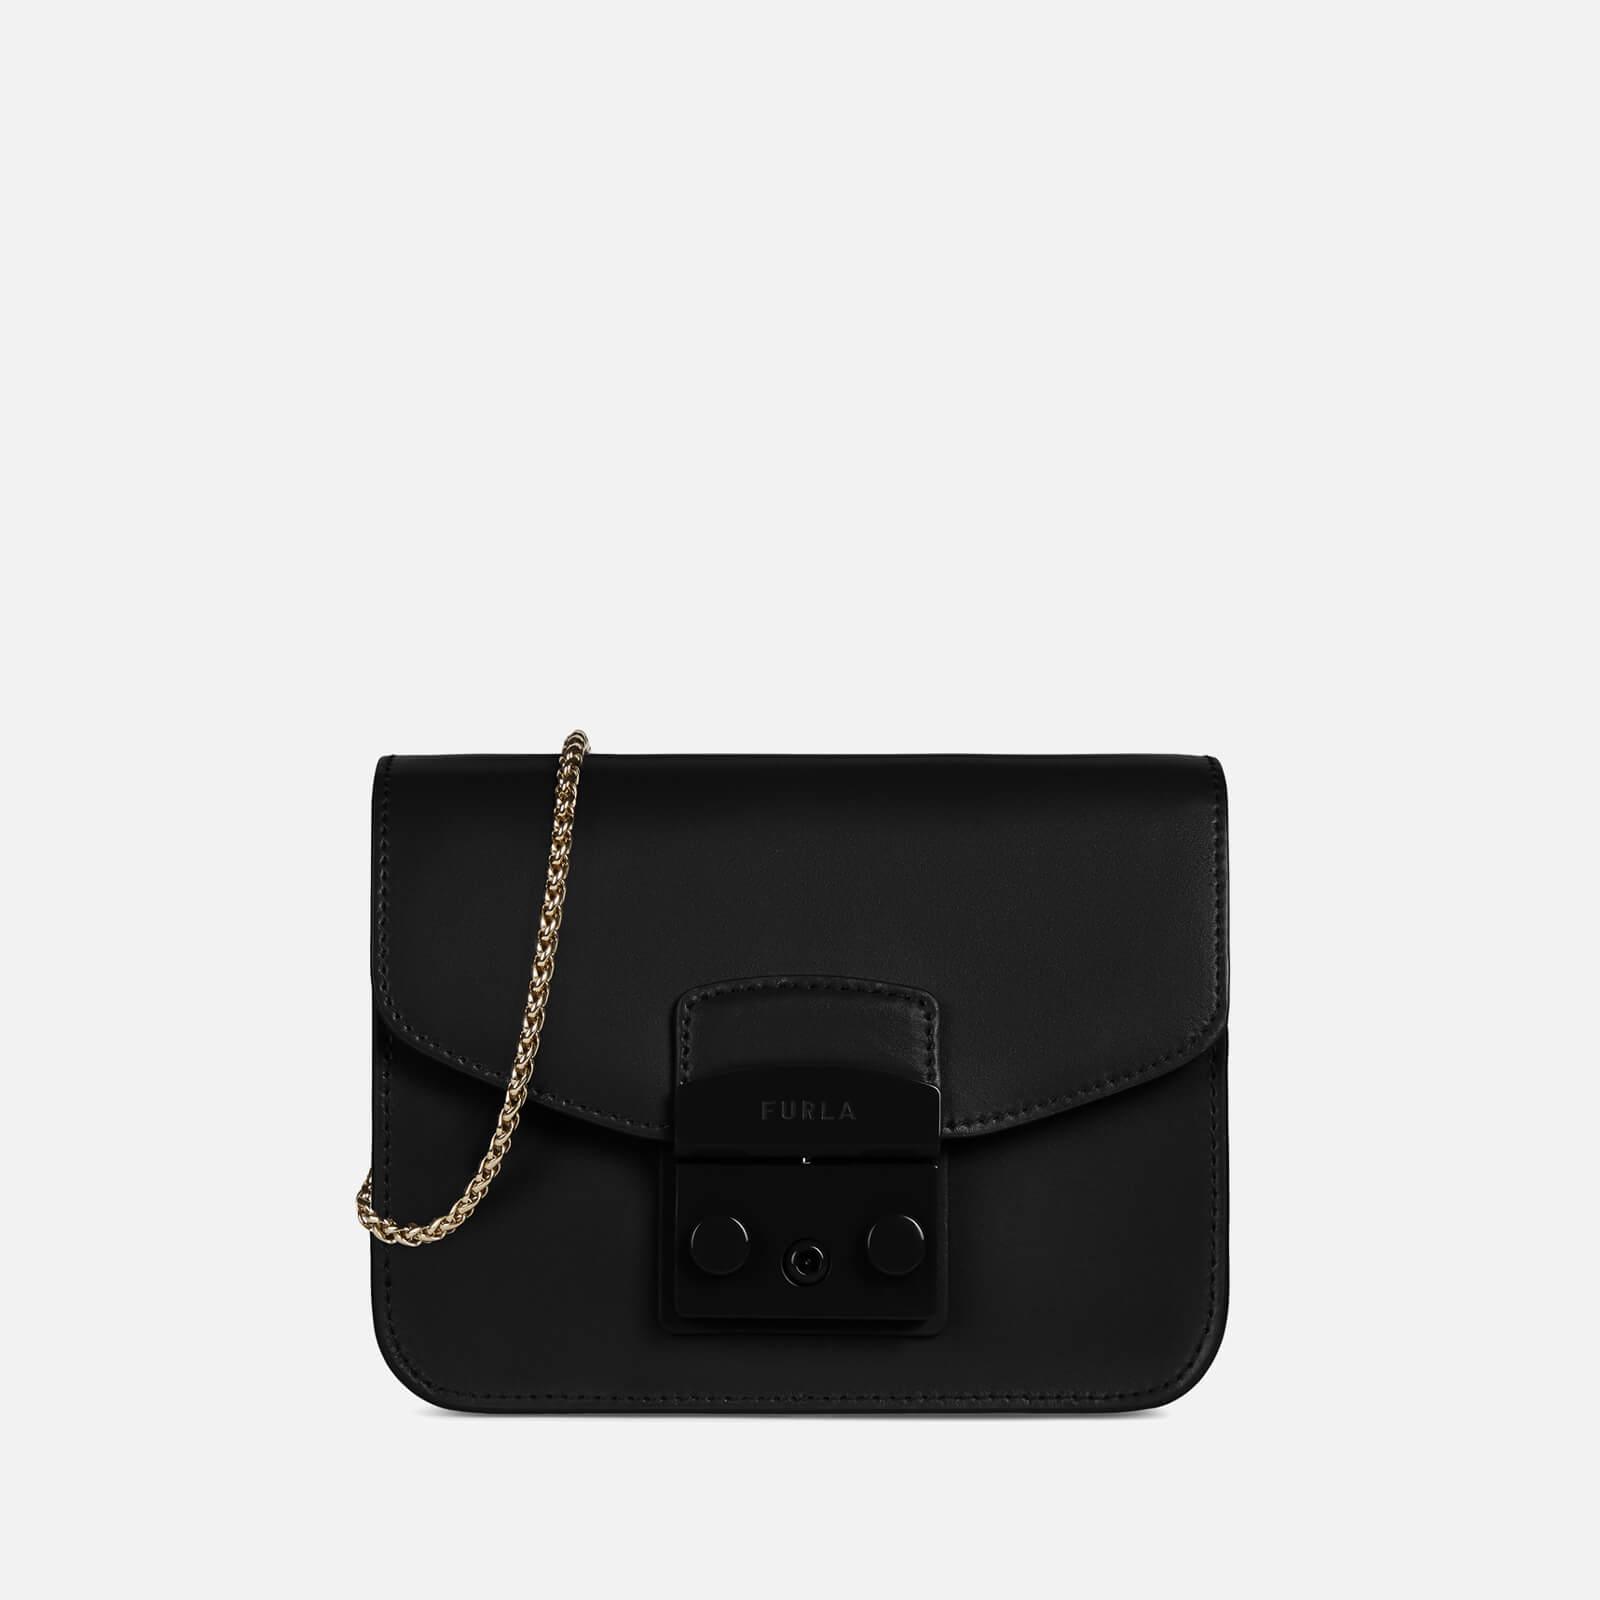 furla women's metropolis mini cross body bag - black